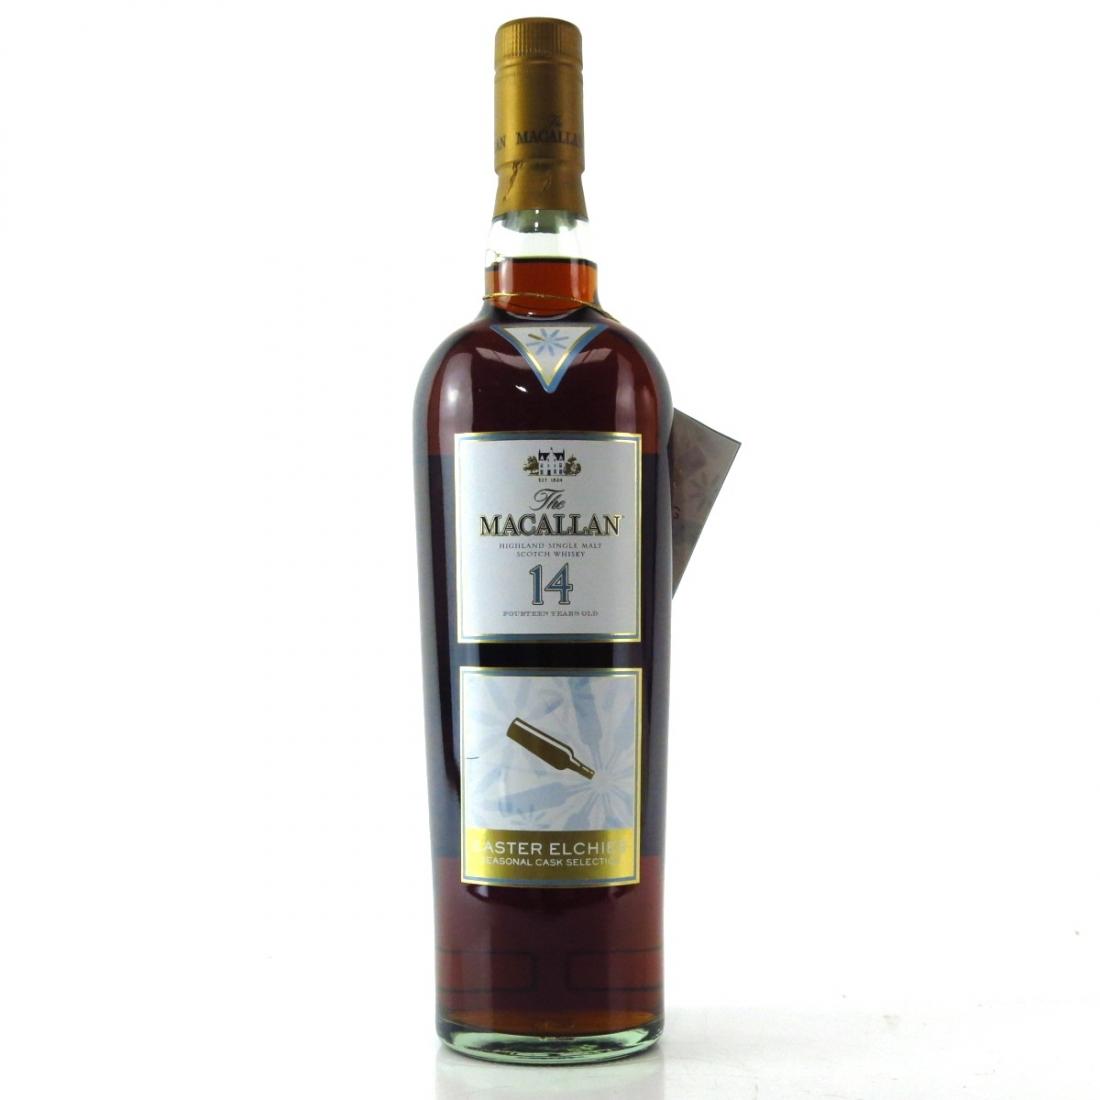 Macallan 1991 Easter Elchies Seasonal Selection 14 Year Old / Winter